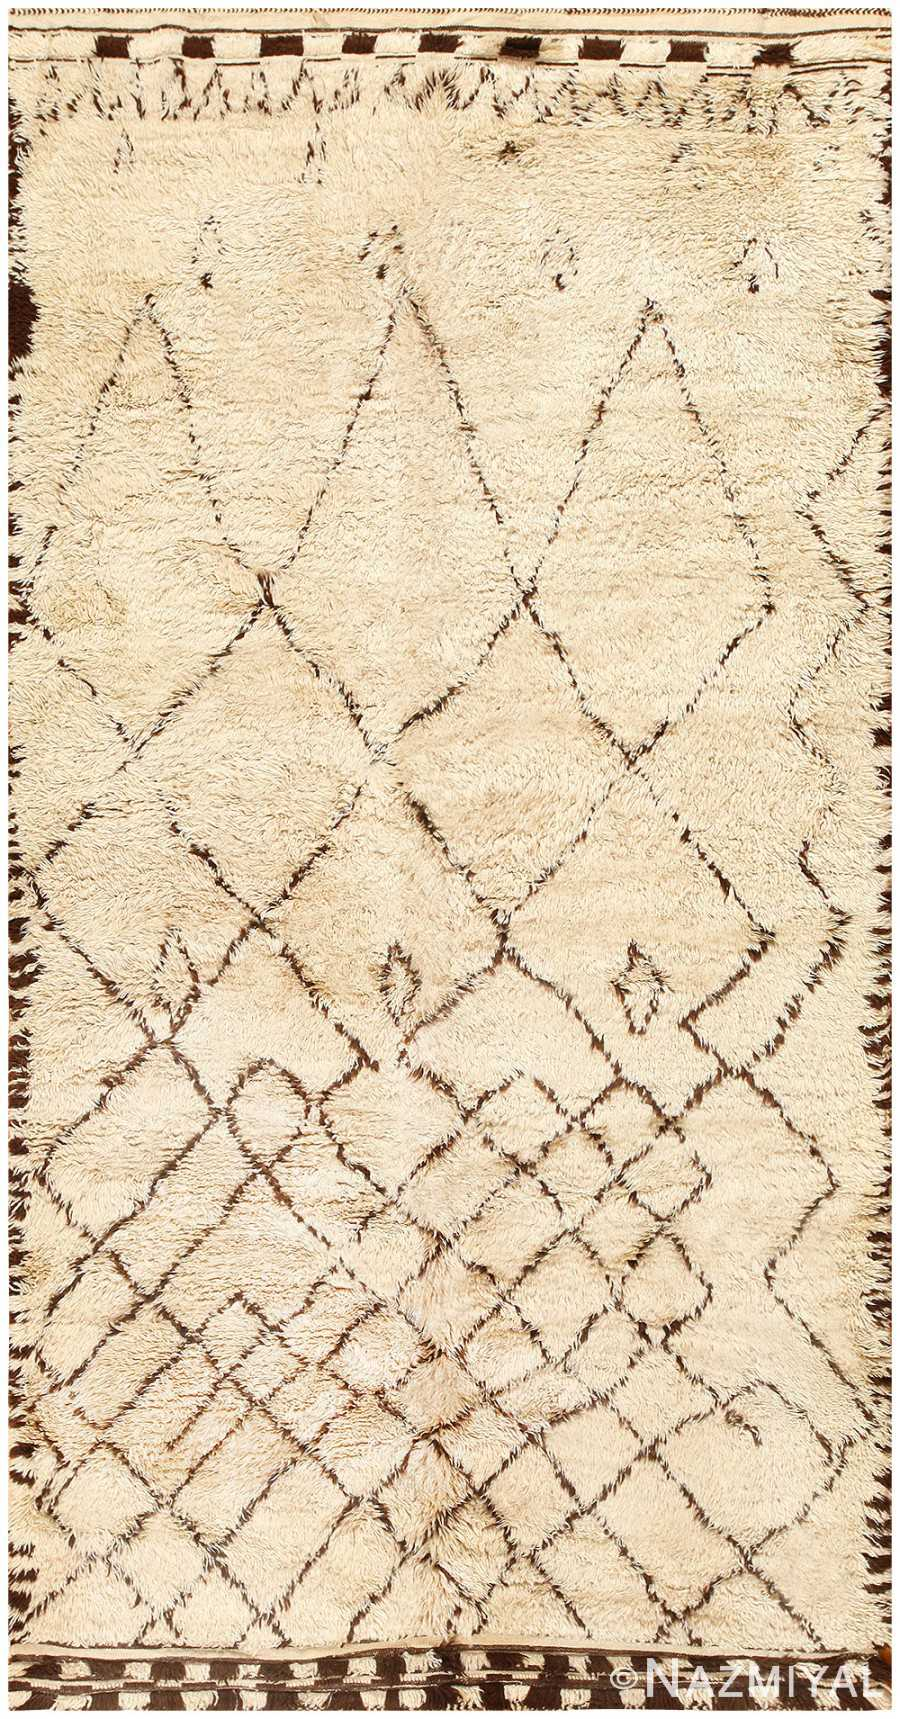 Vintage Moroccan Rug 48390 Detail/Large View